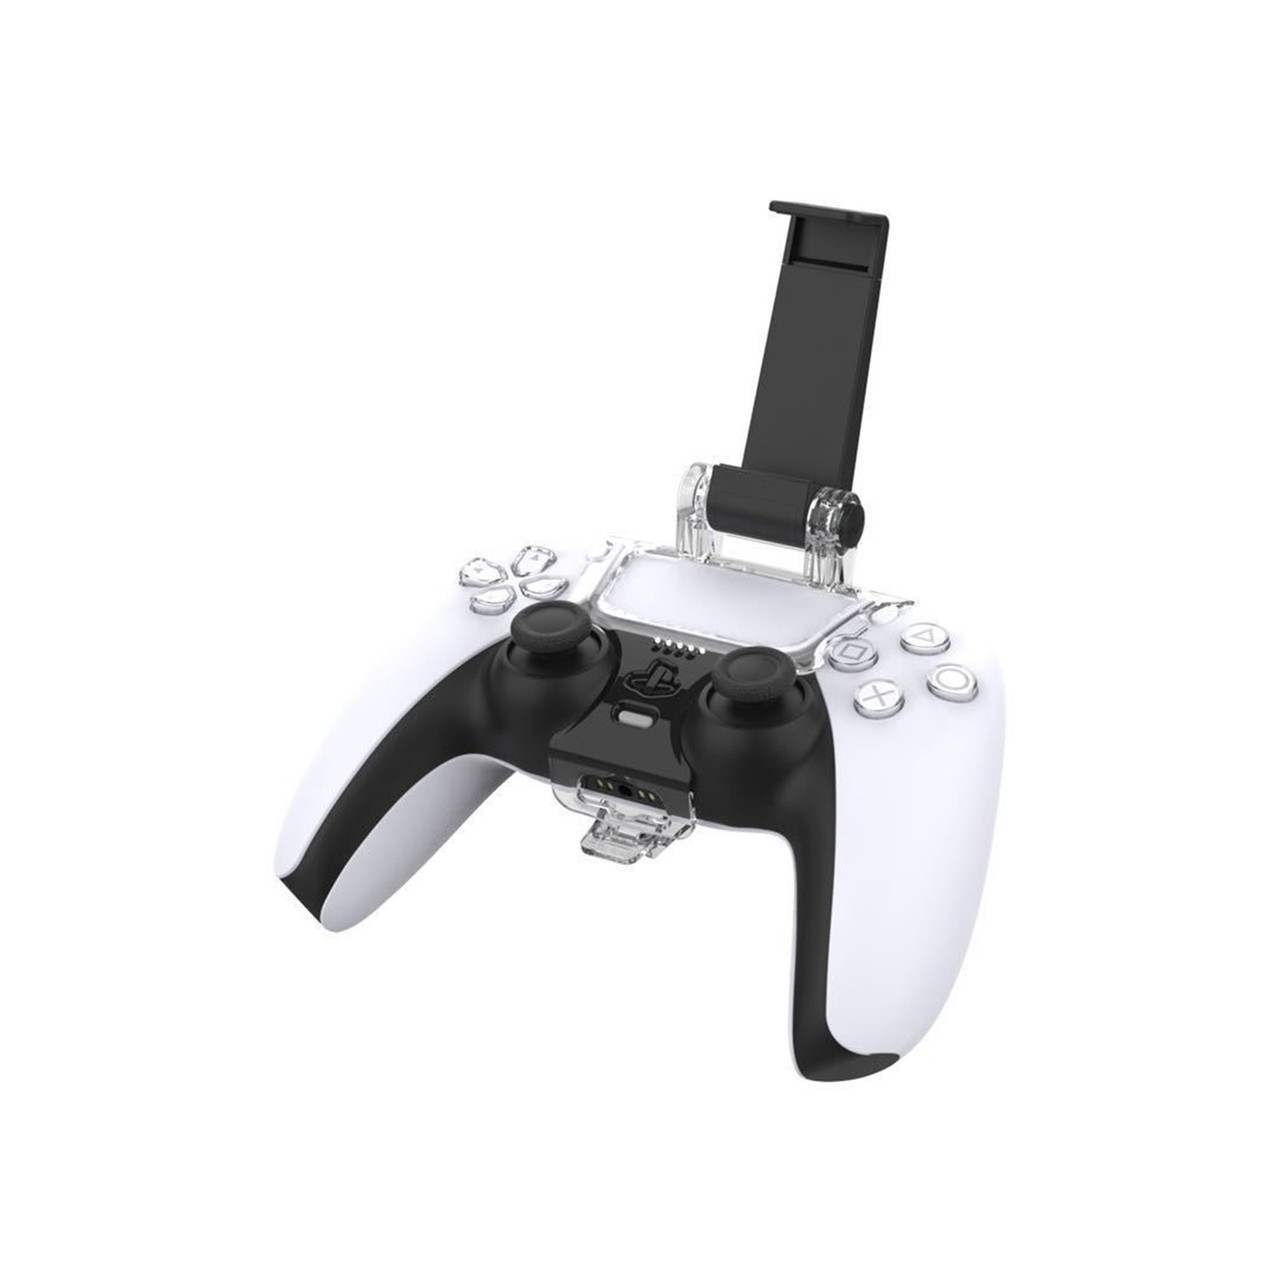 Тримач Кріплення для смартфона на геймпад джойстик Playstation PS5 DualSense 5